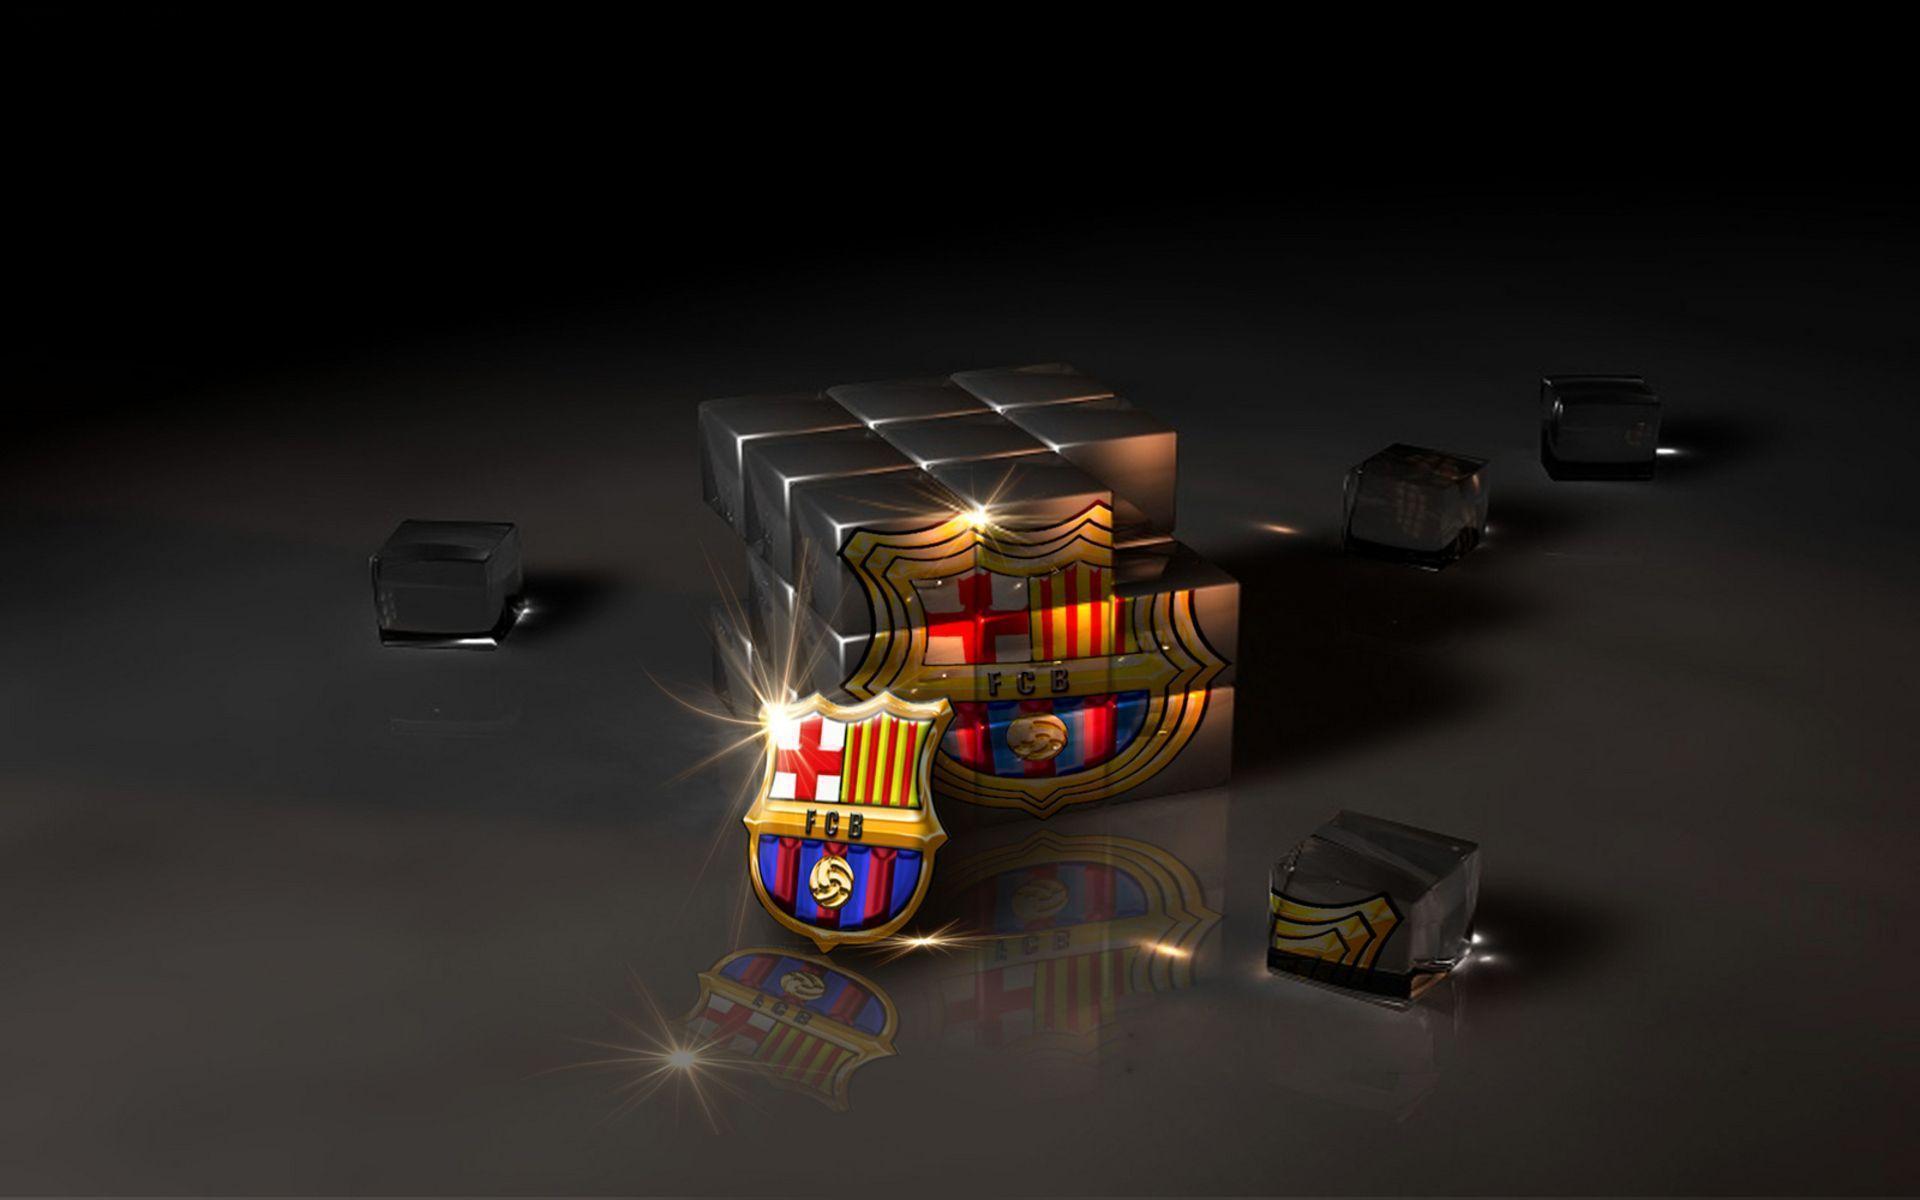 Barcelona Logo Wallpaper | HD Wallpapers, Backgrounds, Images, Art ...